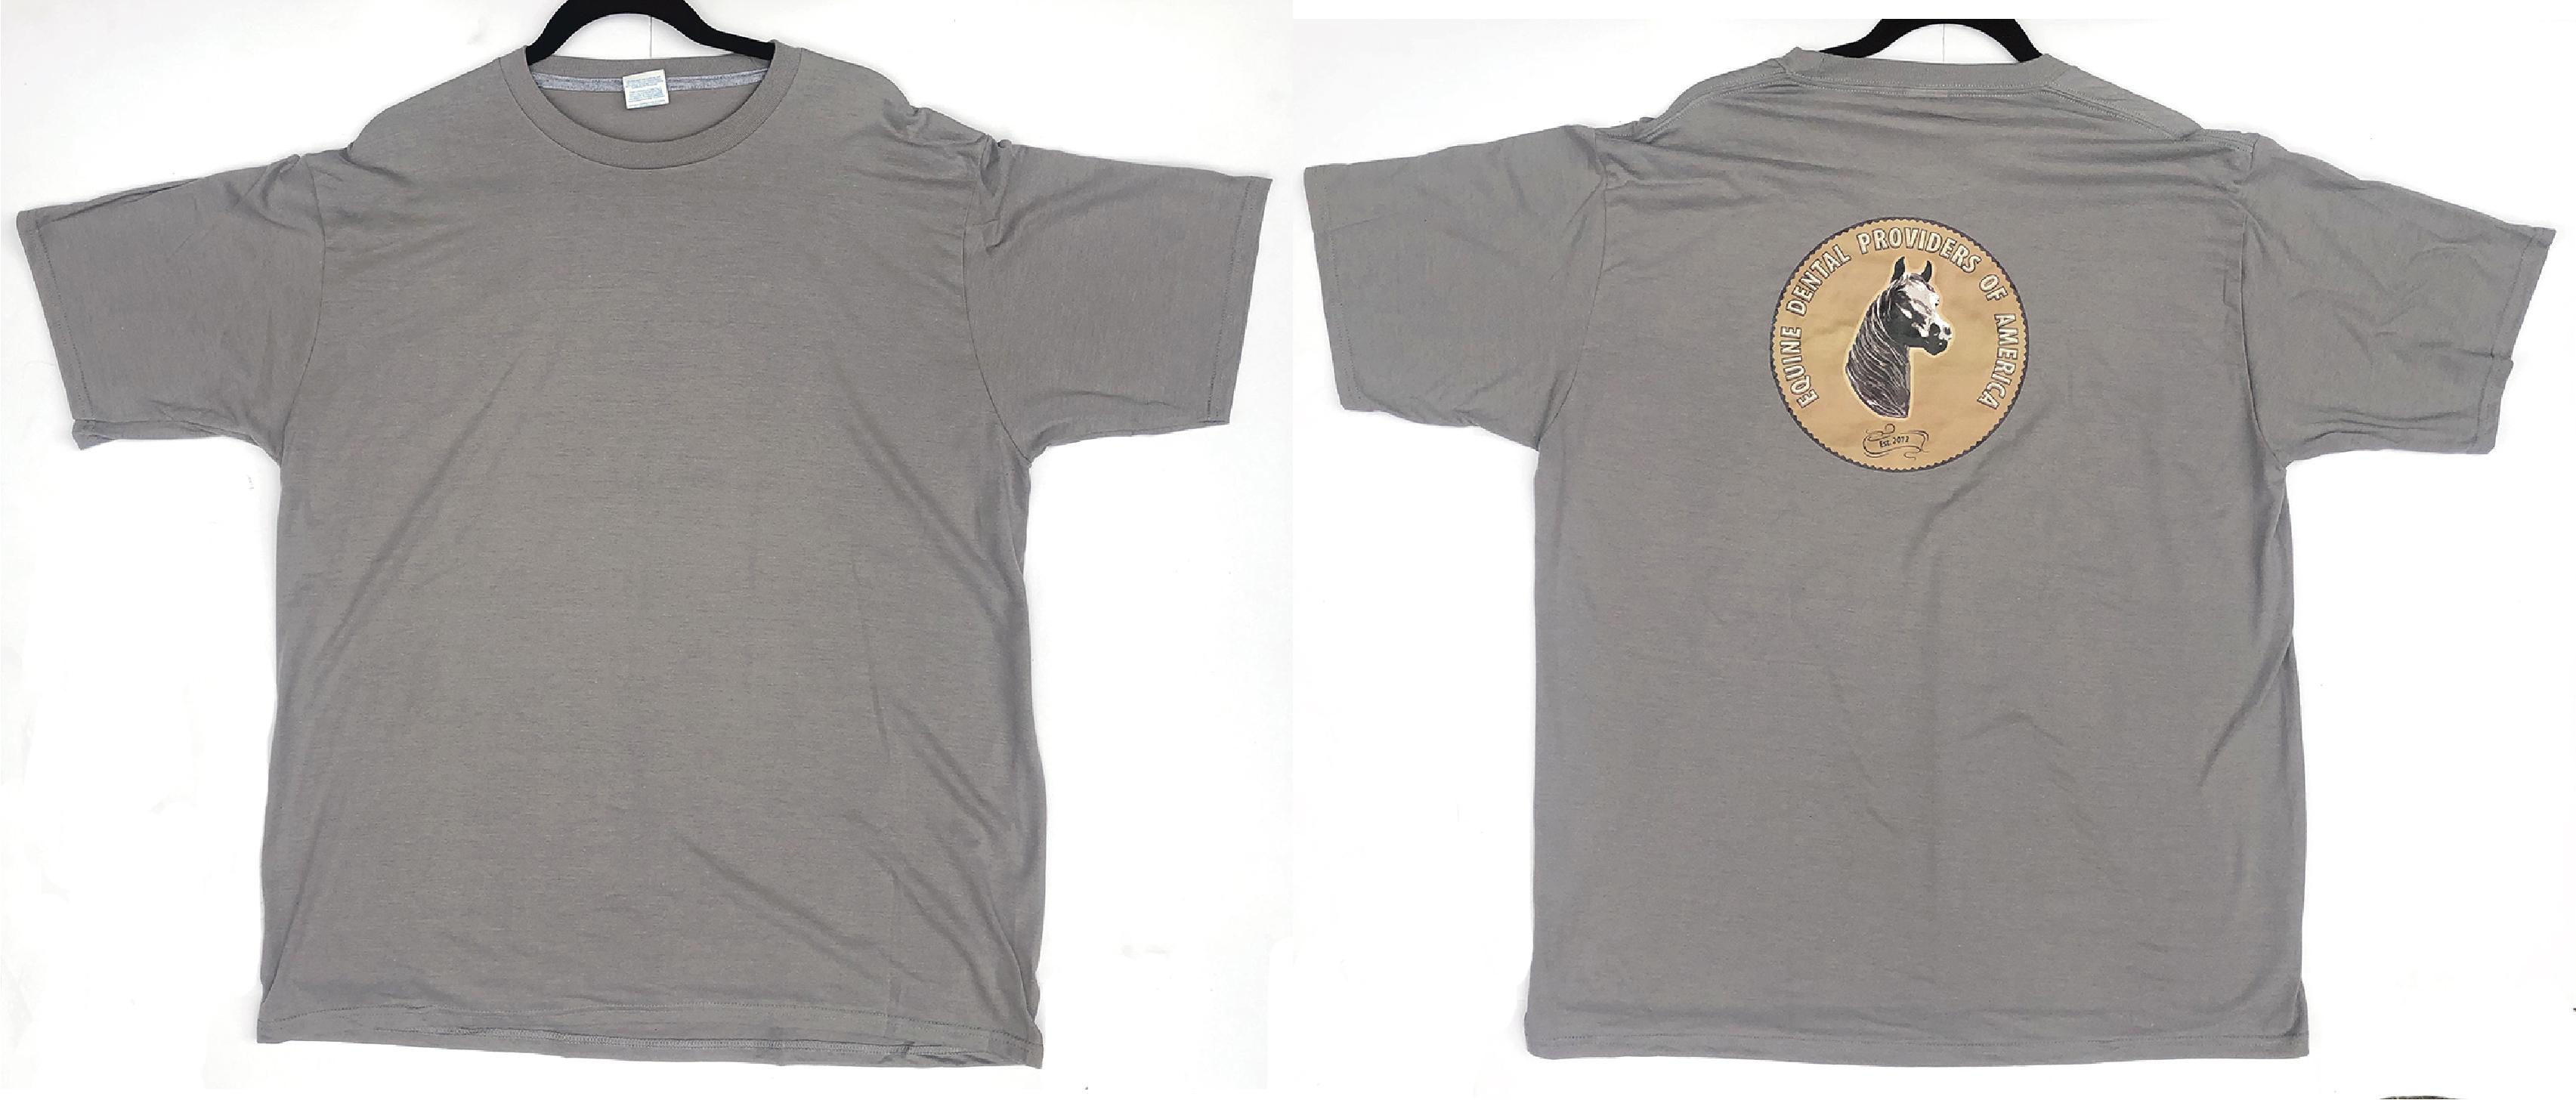 Mens Gray T shirt